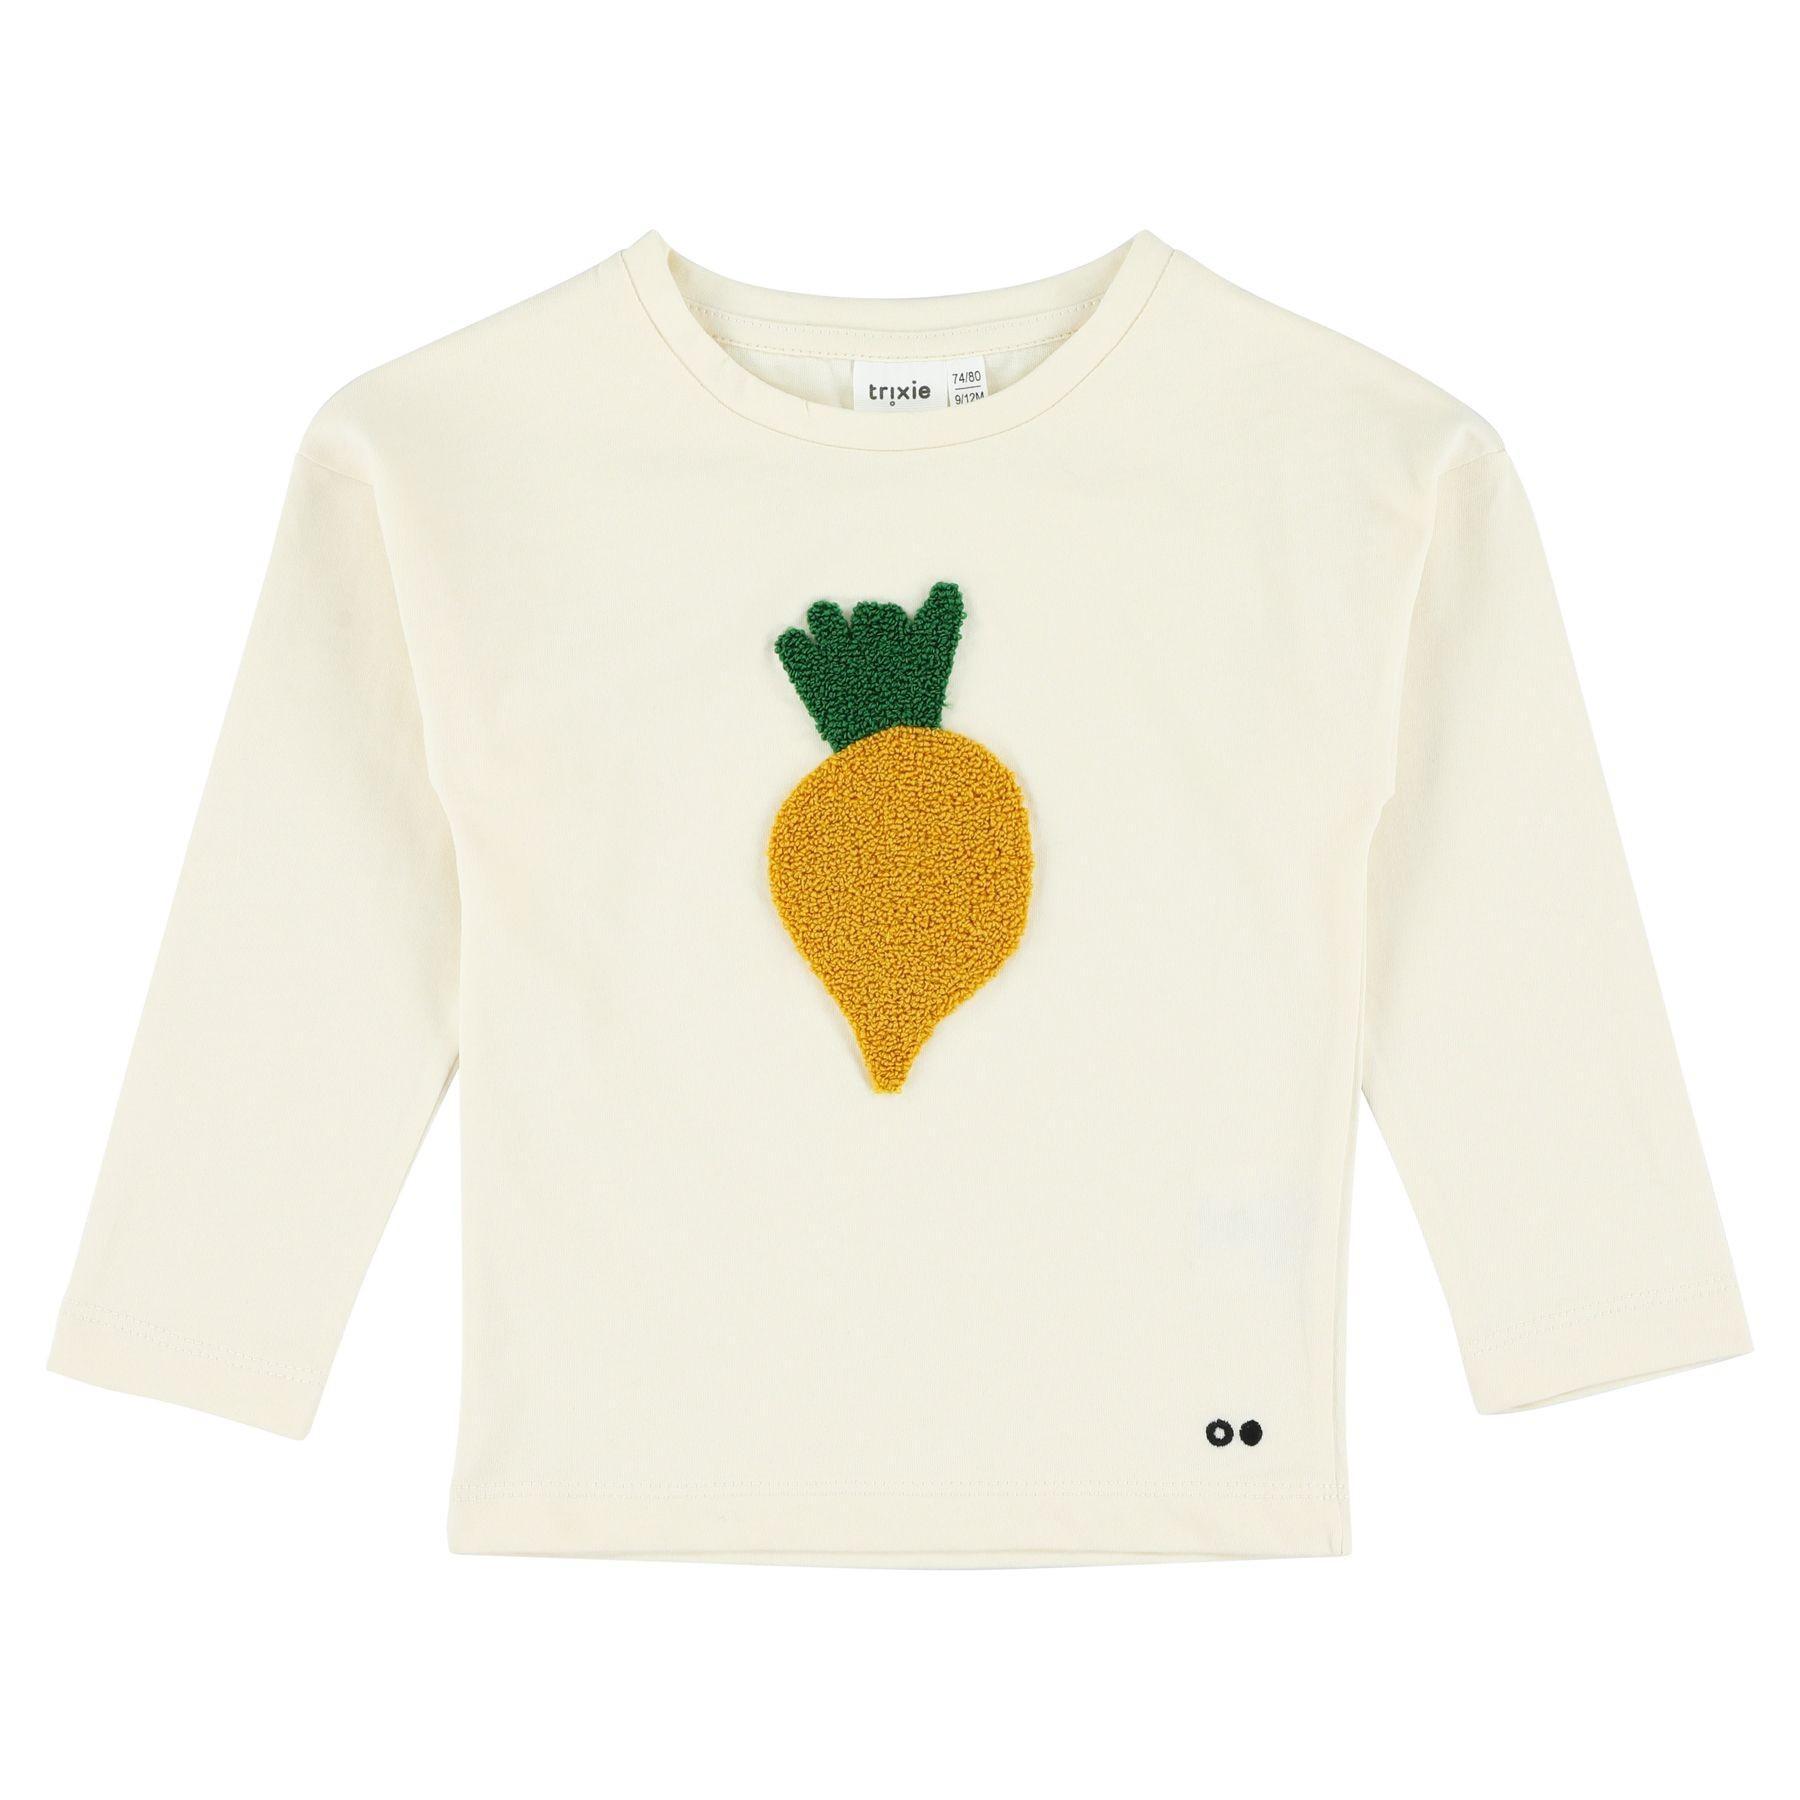 Trixie - T-shirt lange mouwen Tiny Turnip - 9-12M